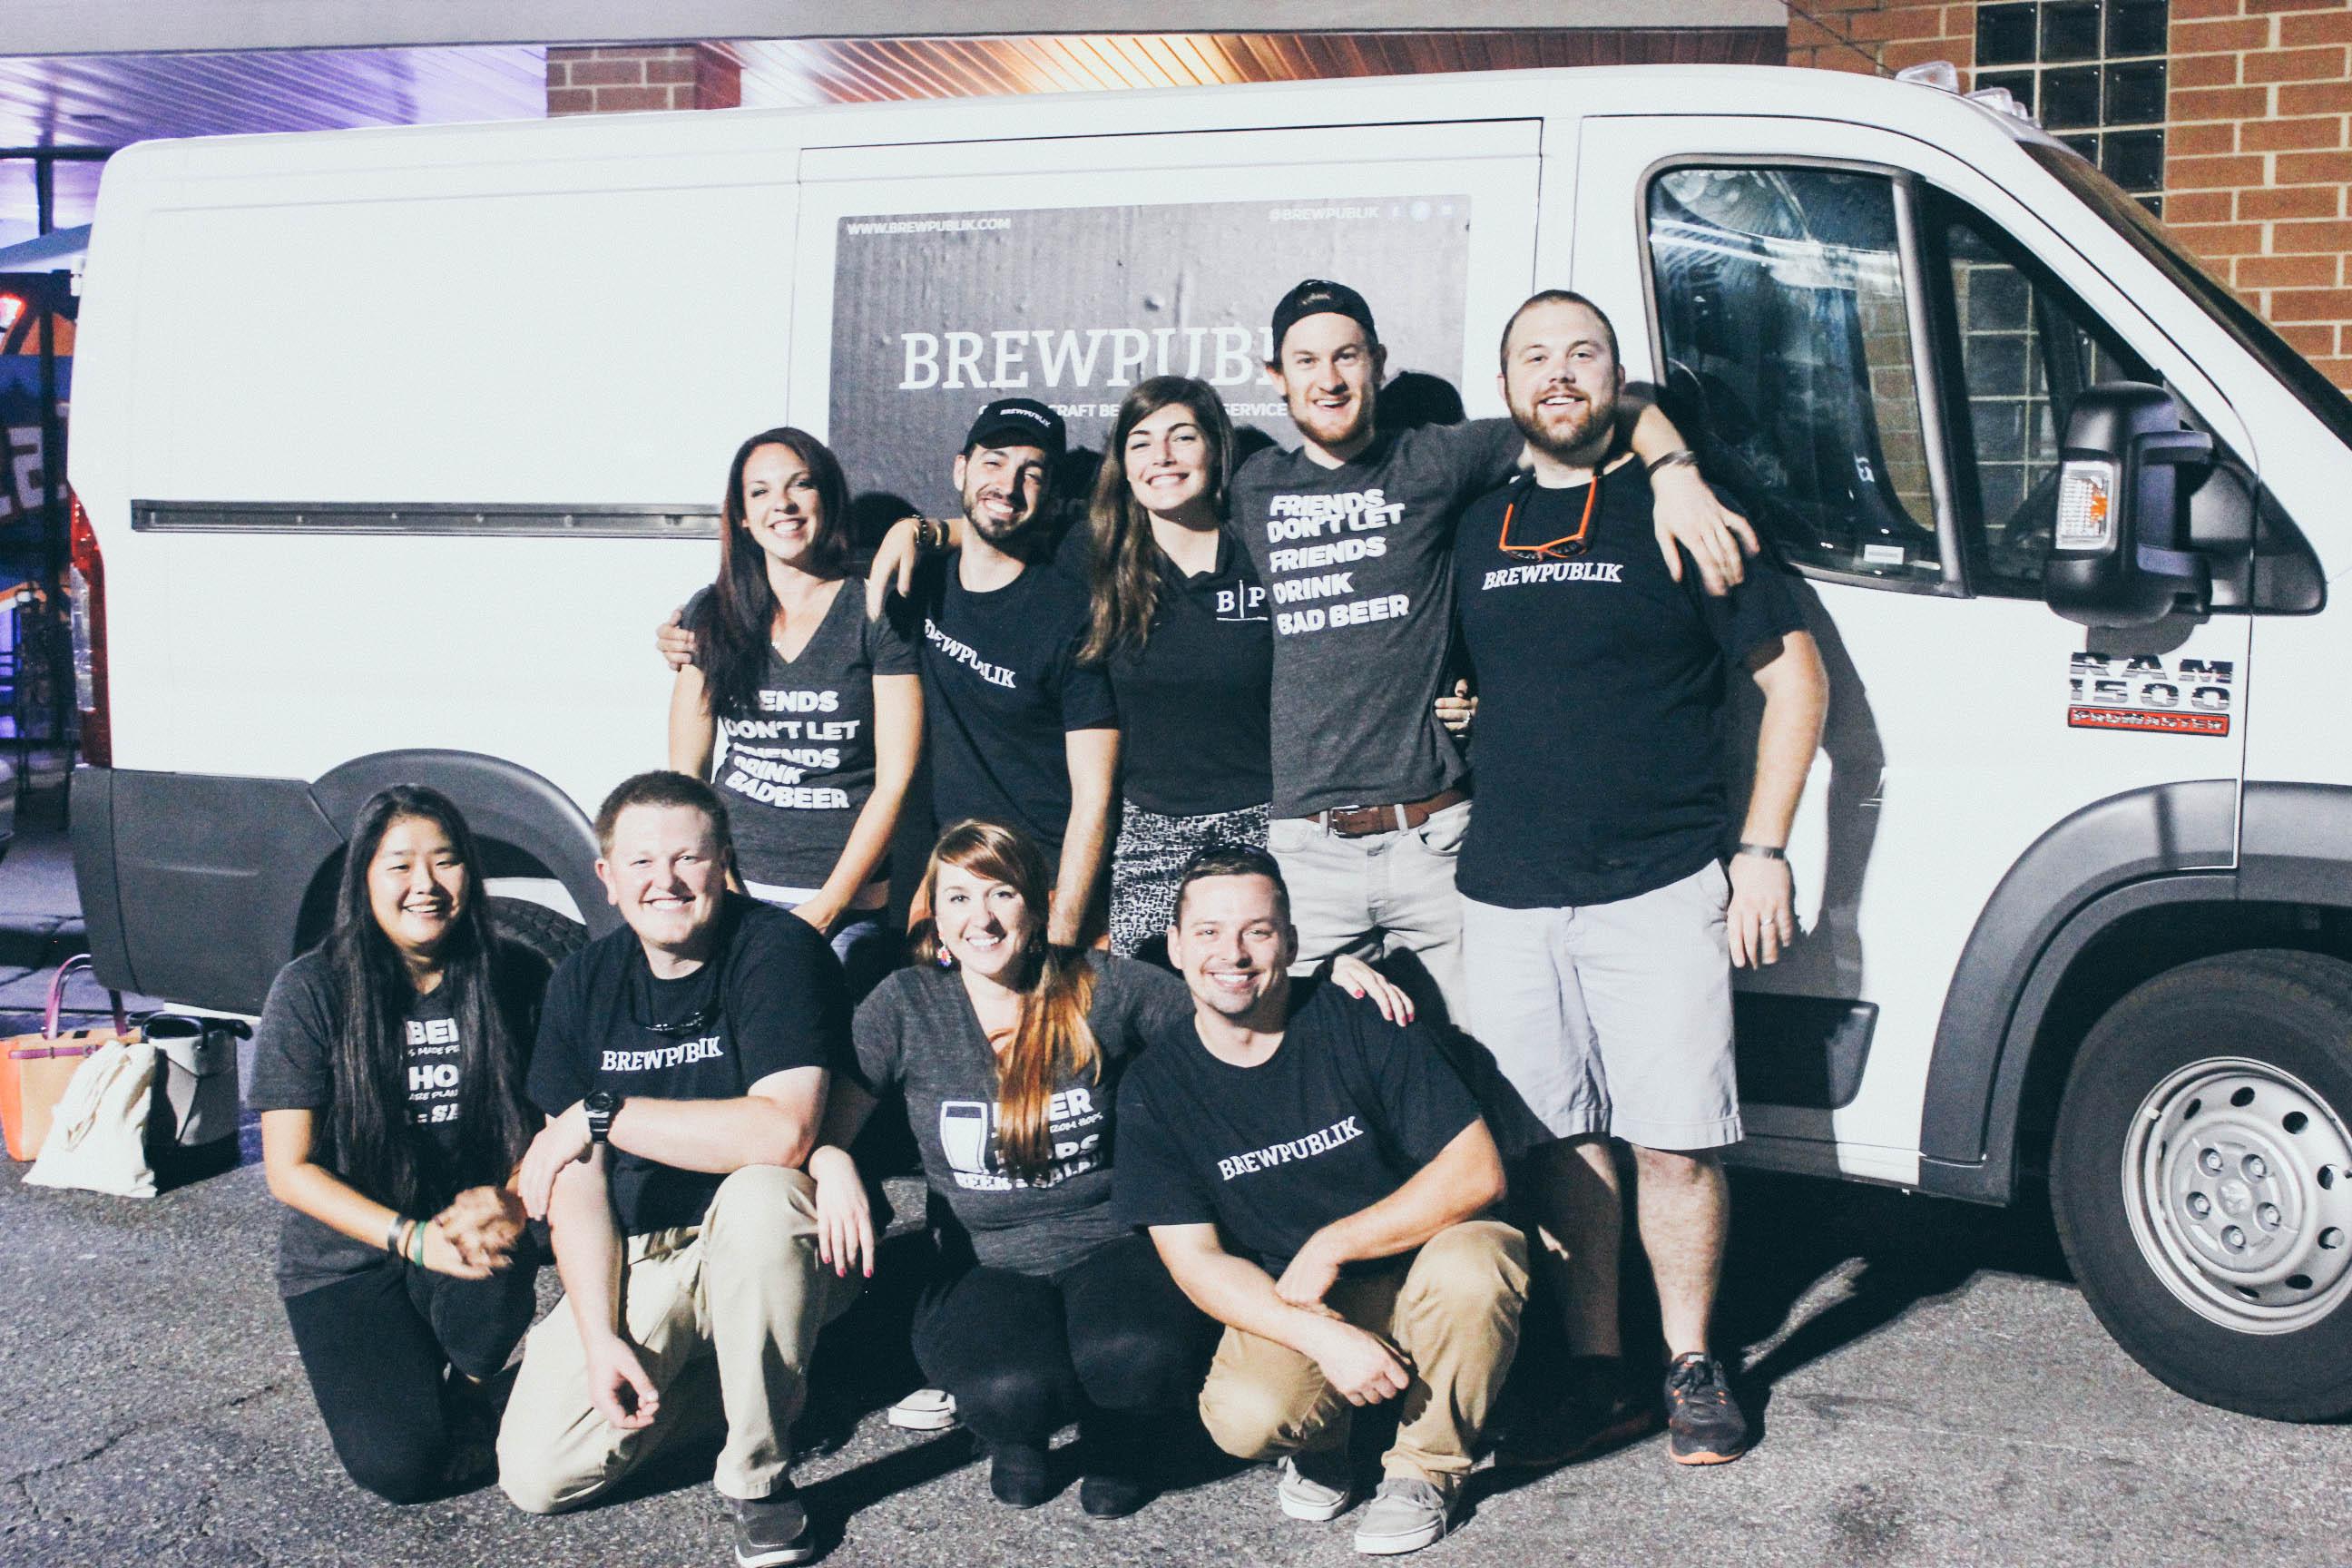 Brewery T Shirt Design Ideas Custom Brewery Shirts Clipart